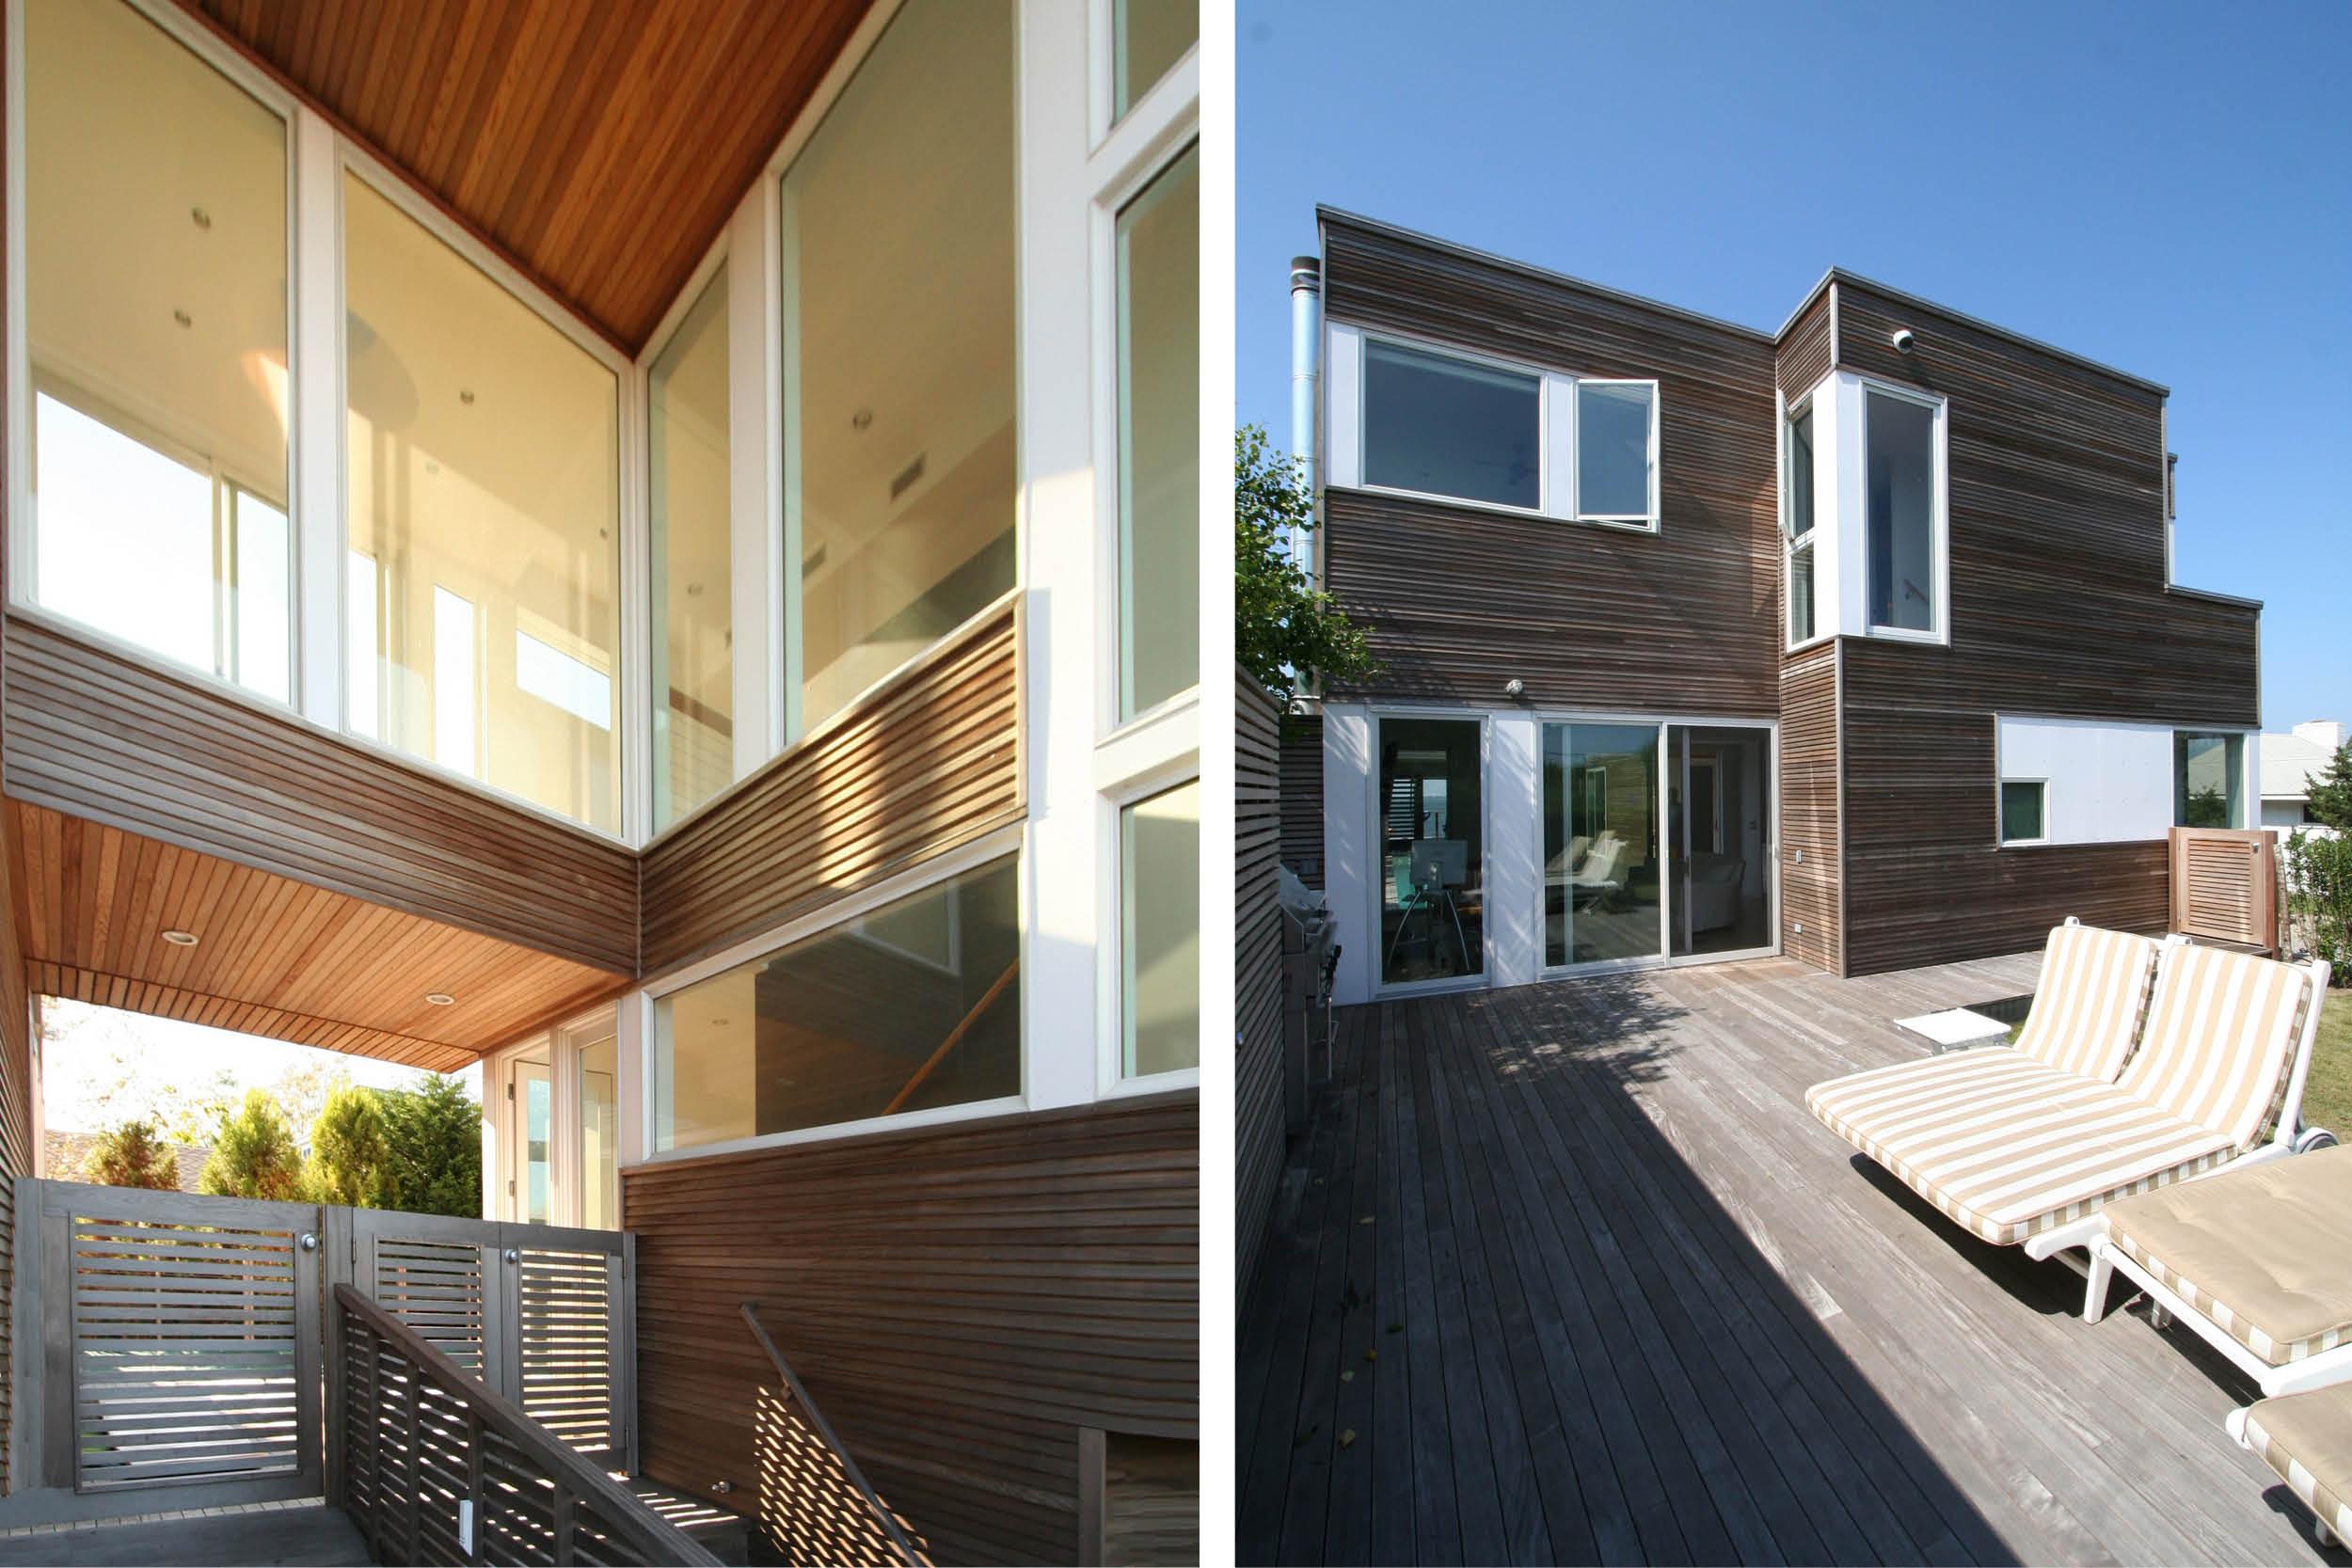 Modern Modular Prefab House | Cedar siding Beach White Windows Room Deck | Fire Island New York | RES4